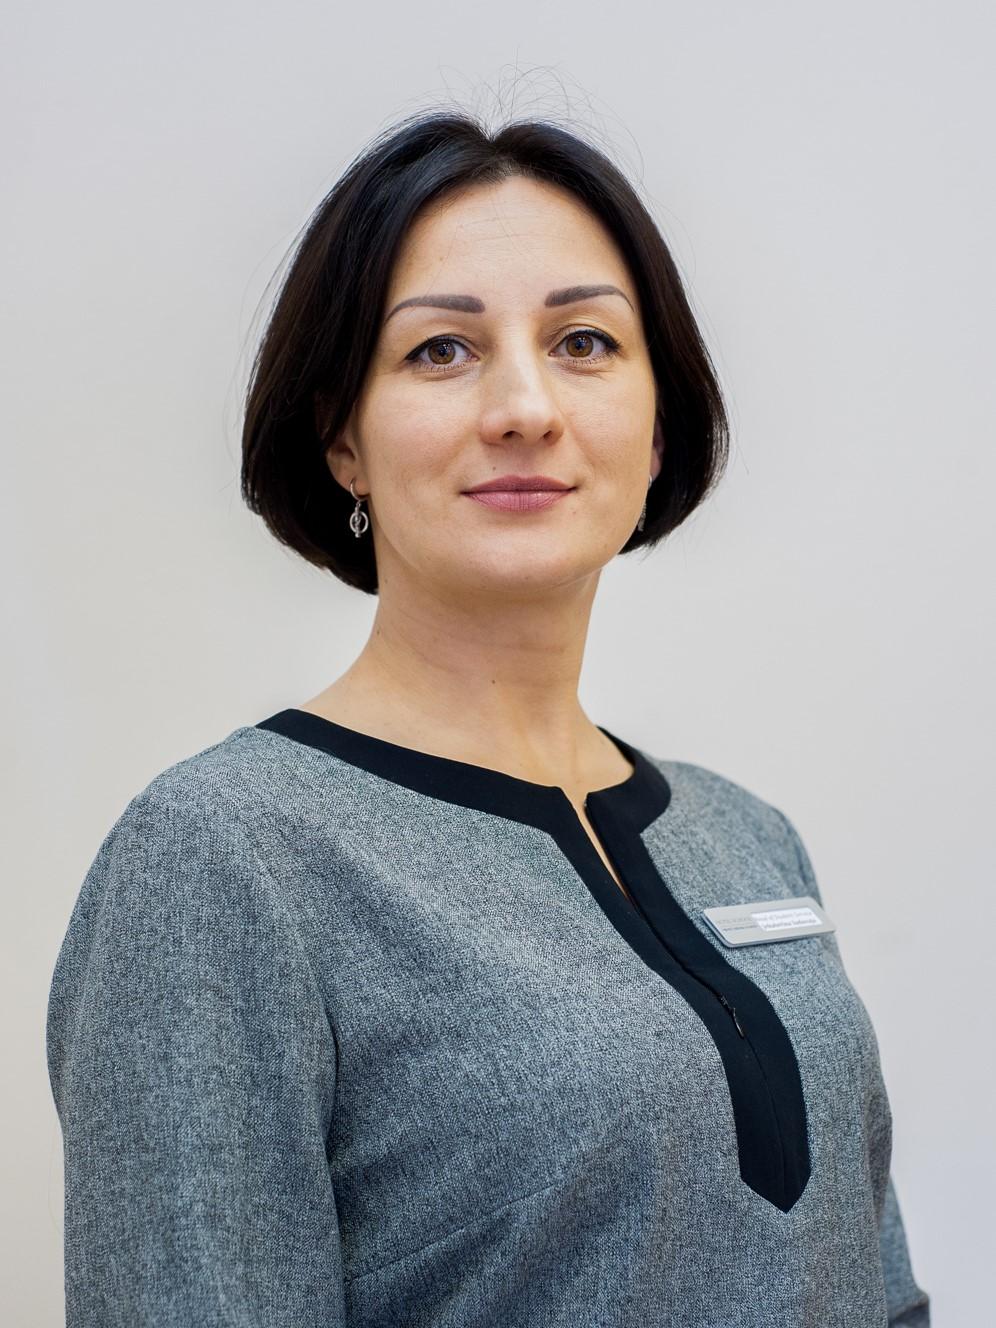 Jekaterina Sadovaja, Head of Student Service